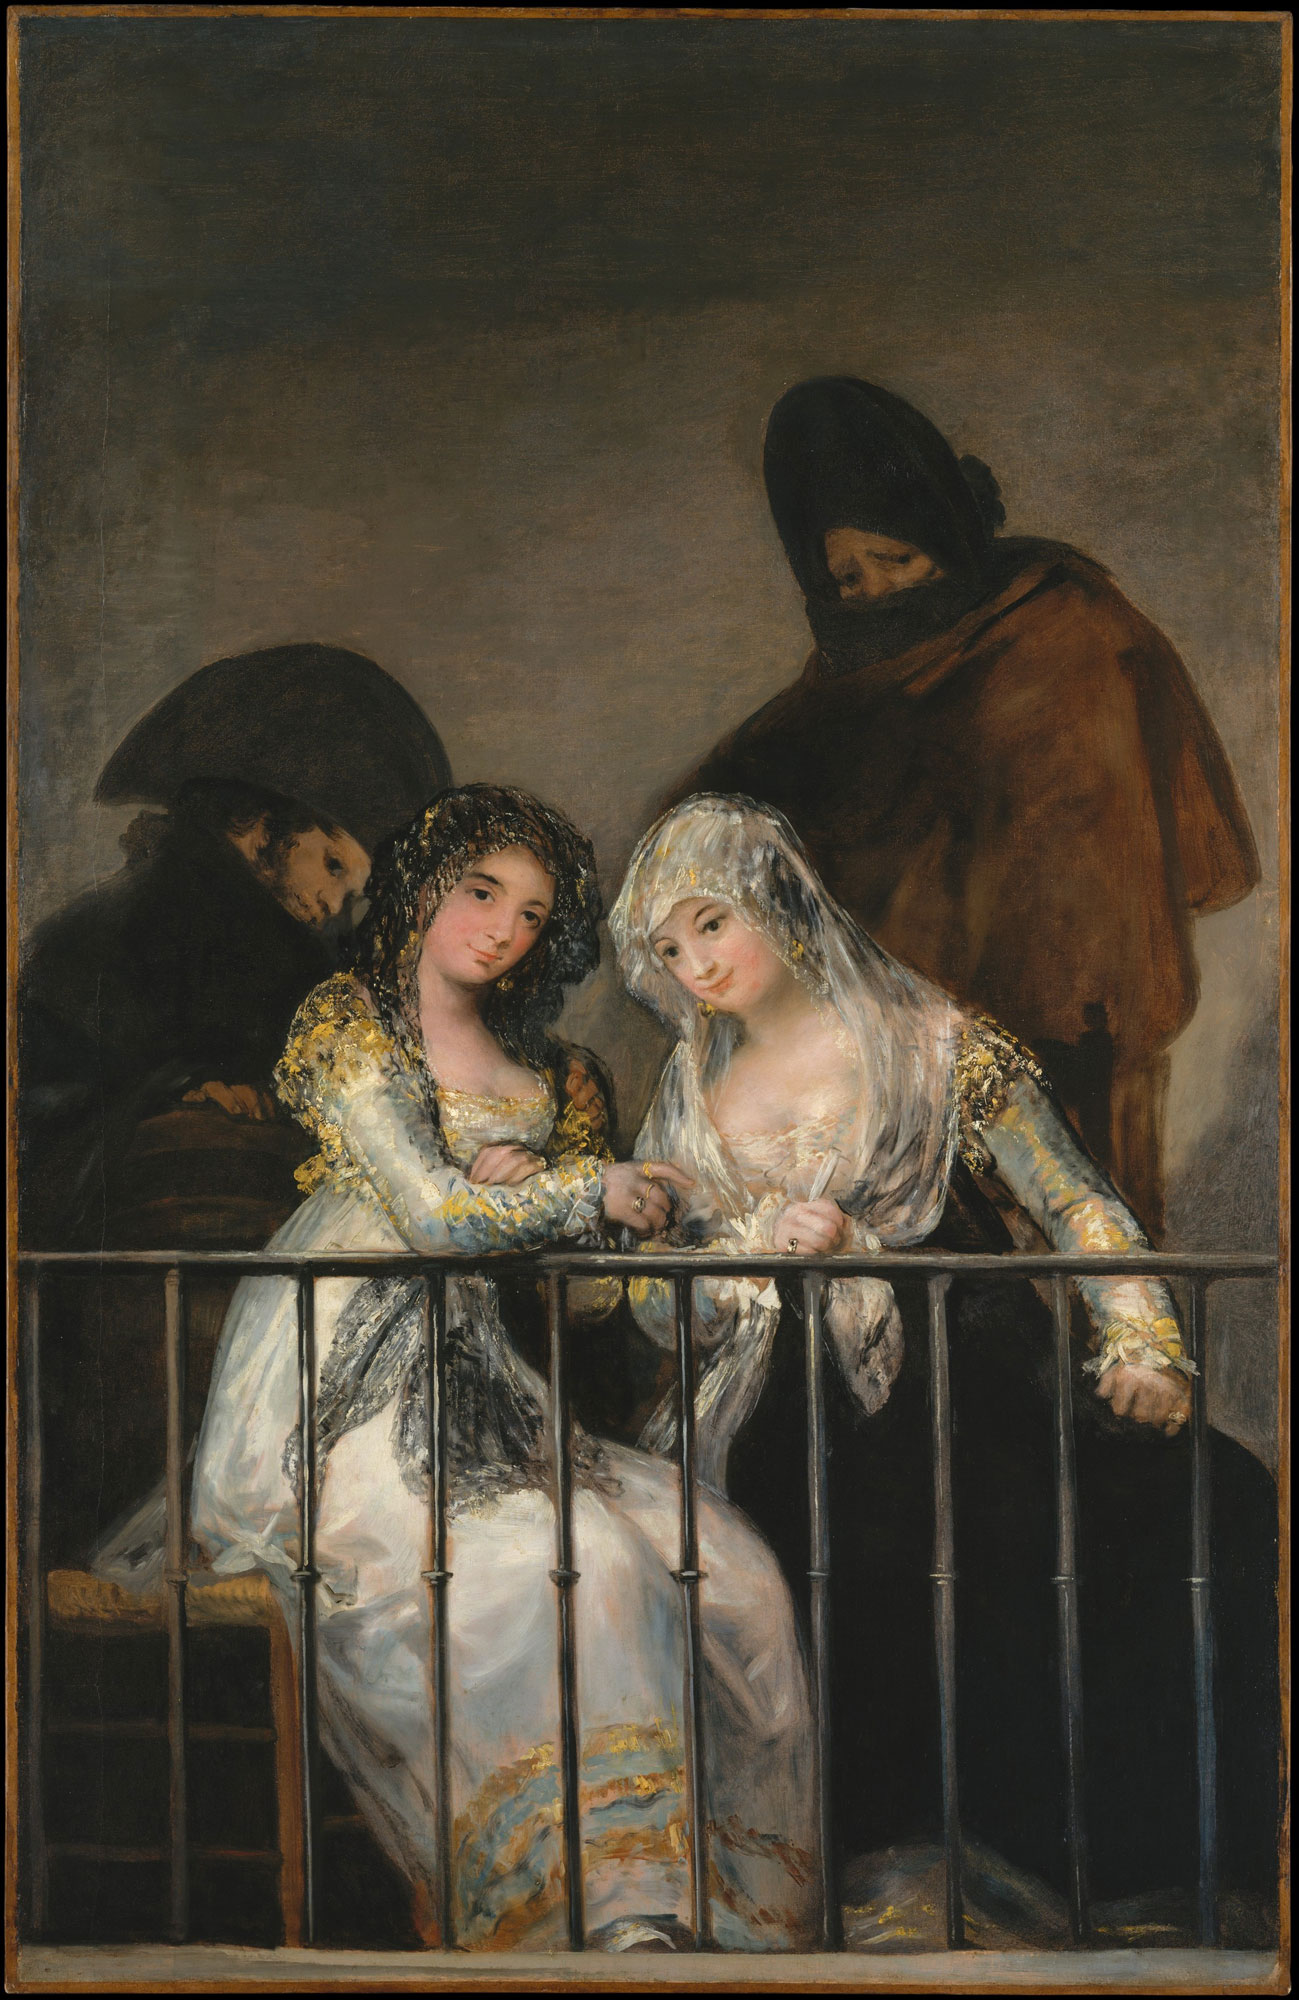 Francisco Goya, Majas al balcone (1800-1810; olio su tela, 195 x 125,5 cm; New York, Metropolitan Museum of Art)